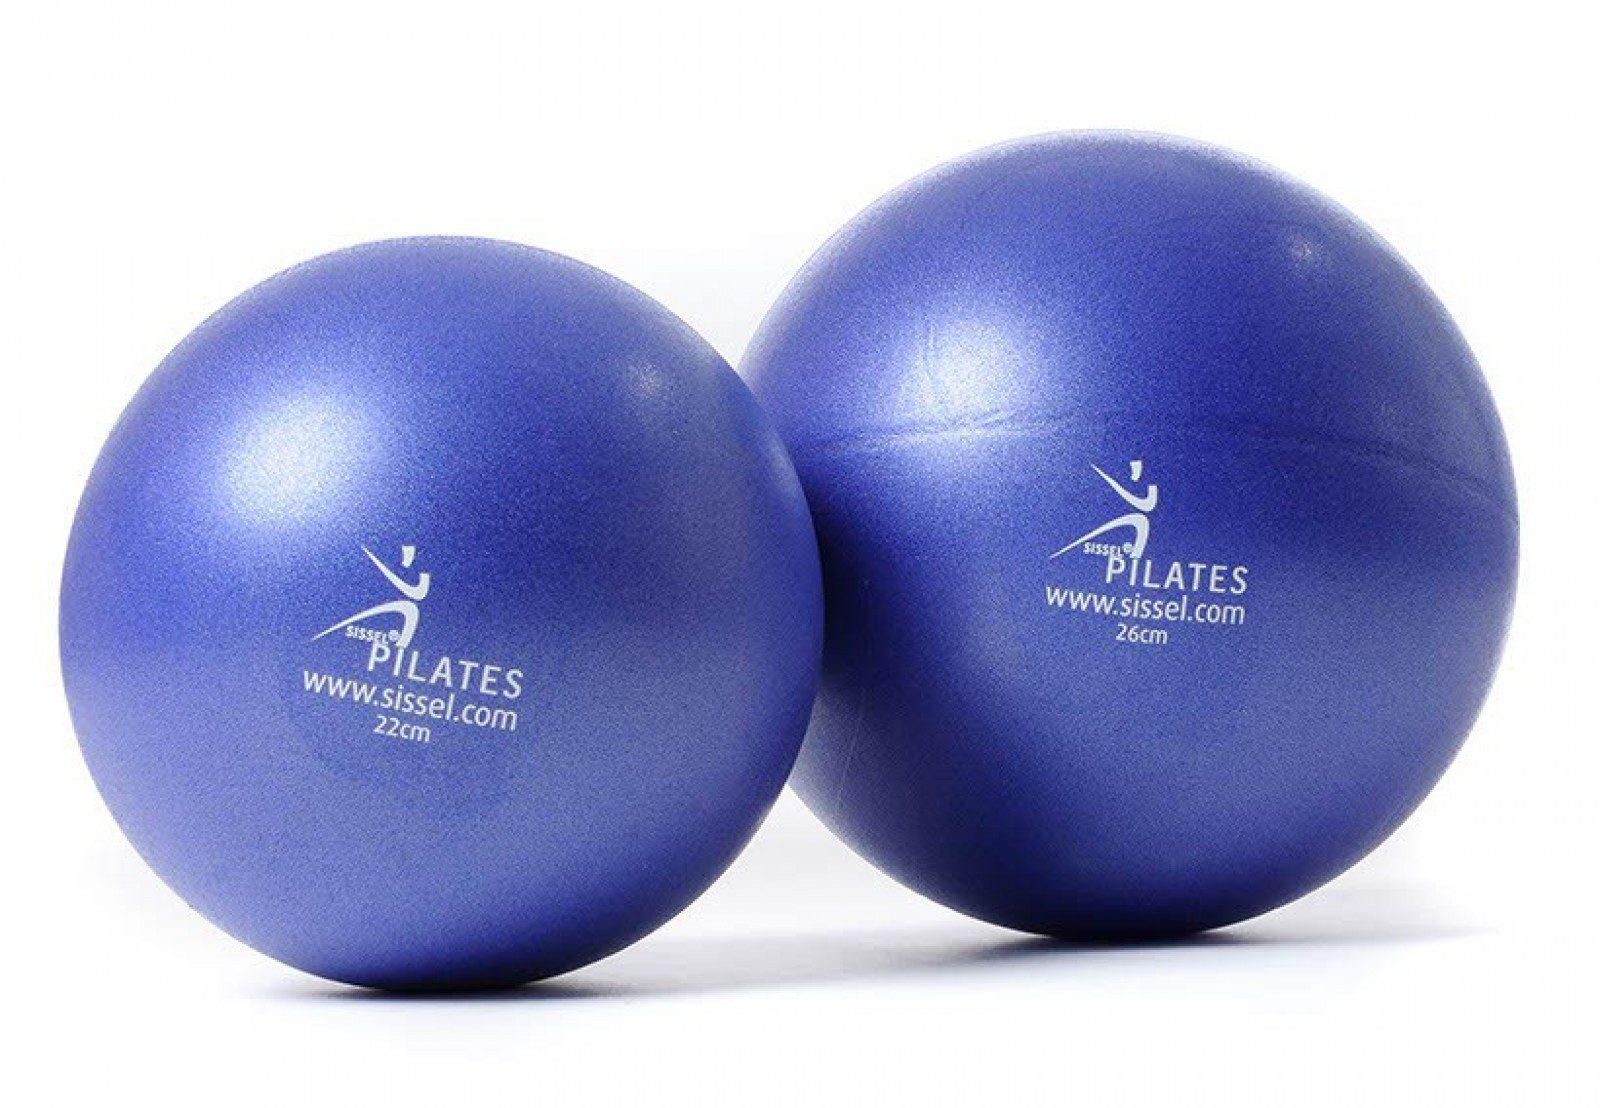 Small Squishy Exercise Ball : Pilates Mini Exercise Ball - Sittingwell